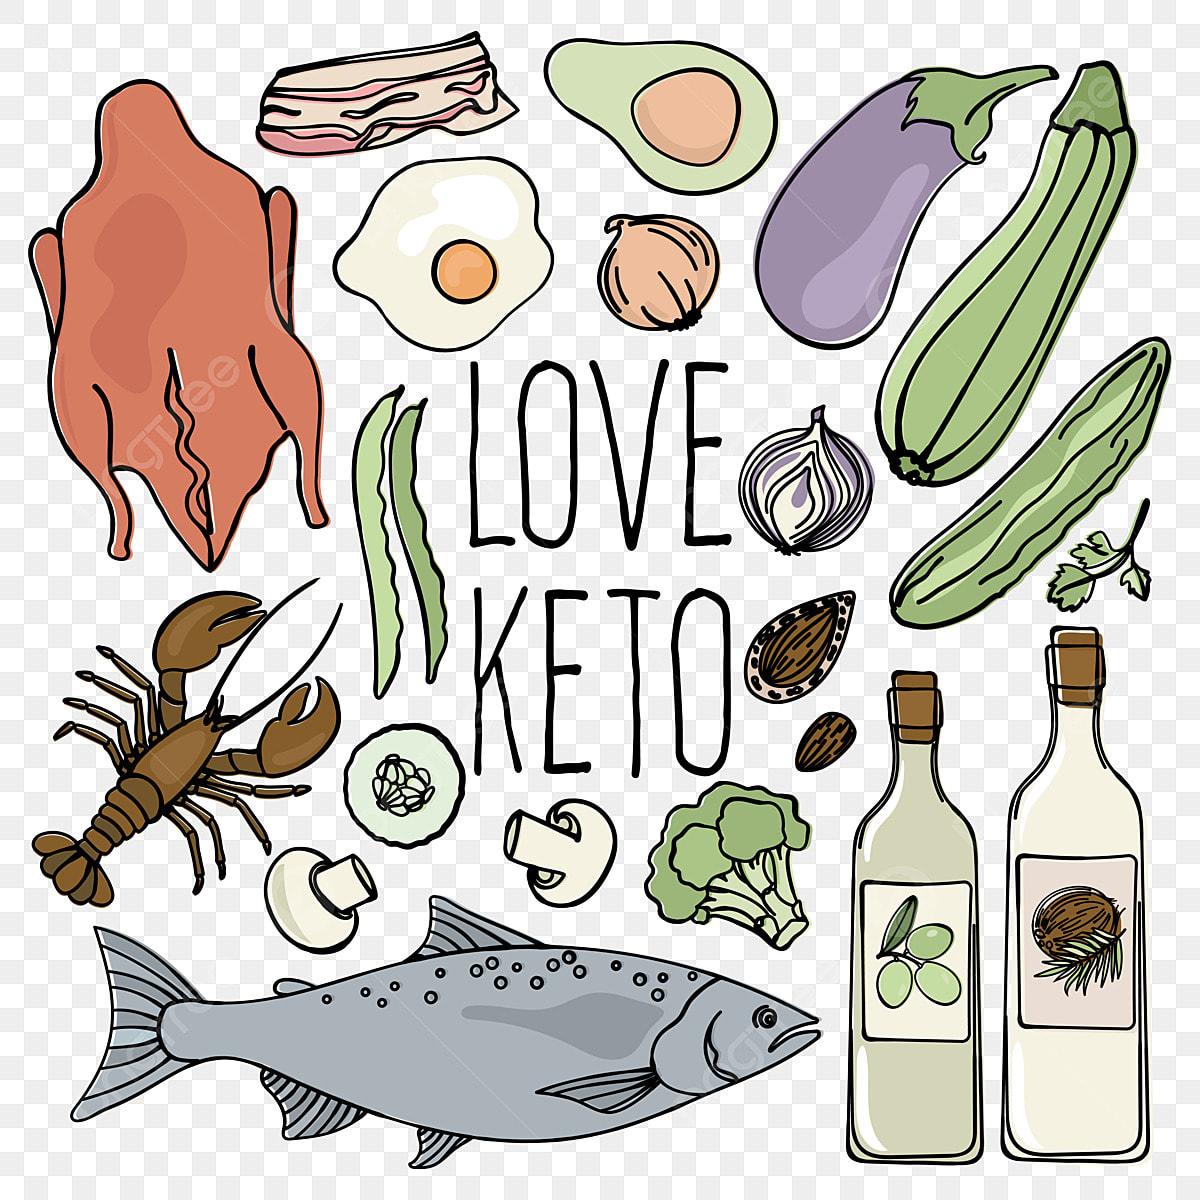 Keto Shop Healthy Food Low Carb Diet Organic Proper